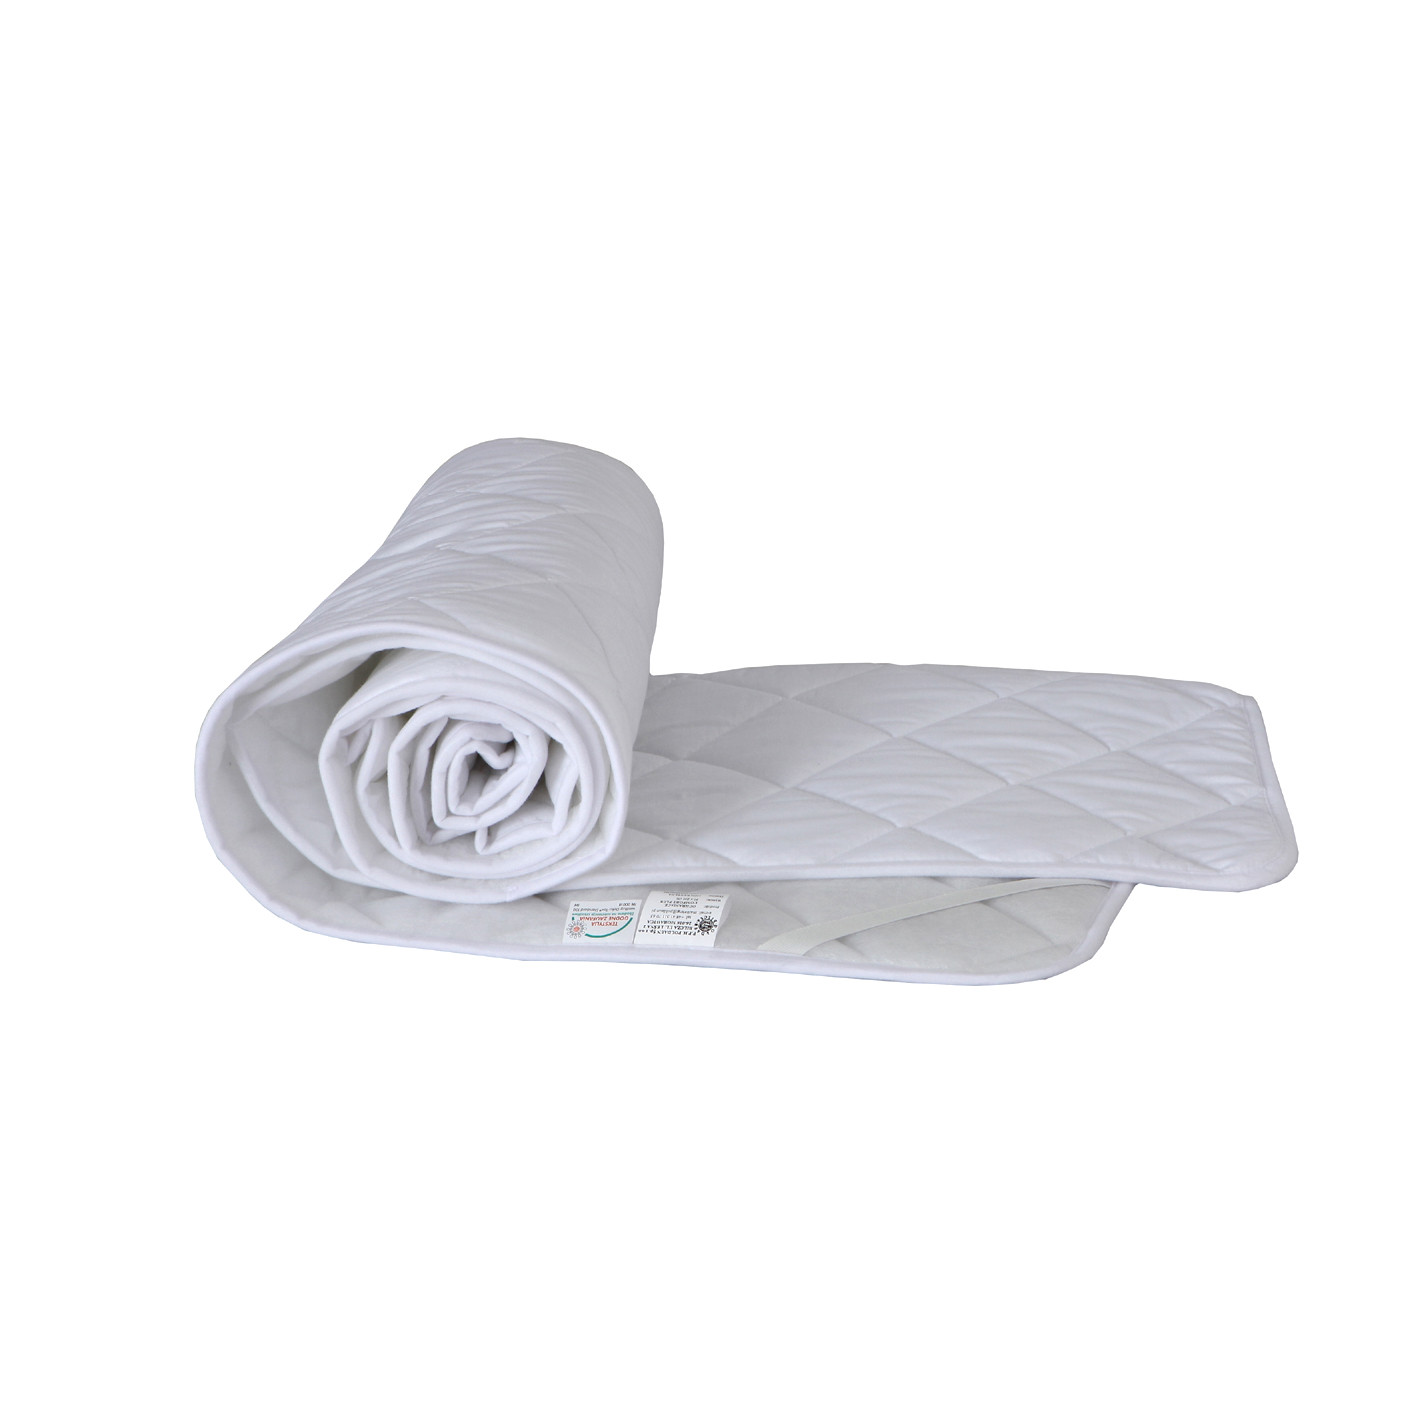 Ochraniacz na materac Comfort Plus 140x200